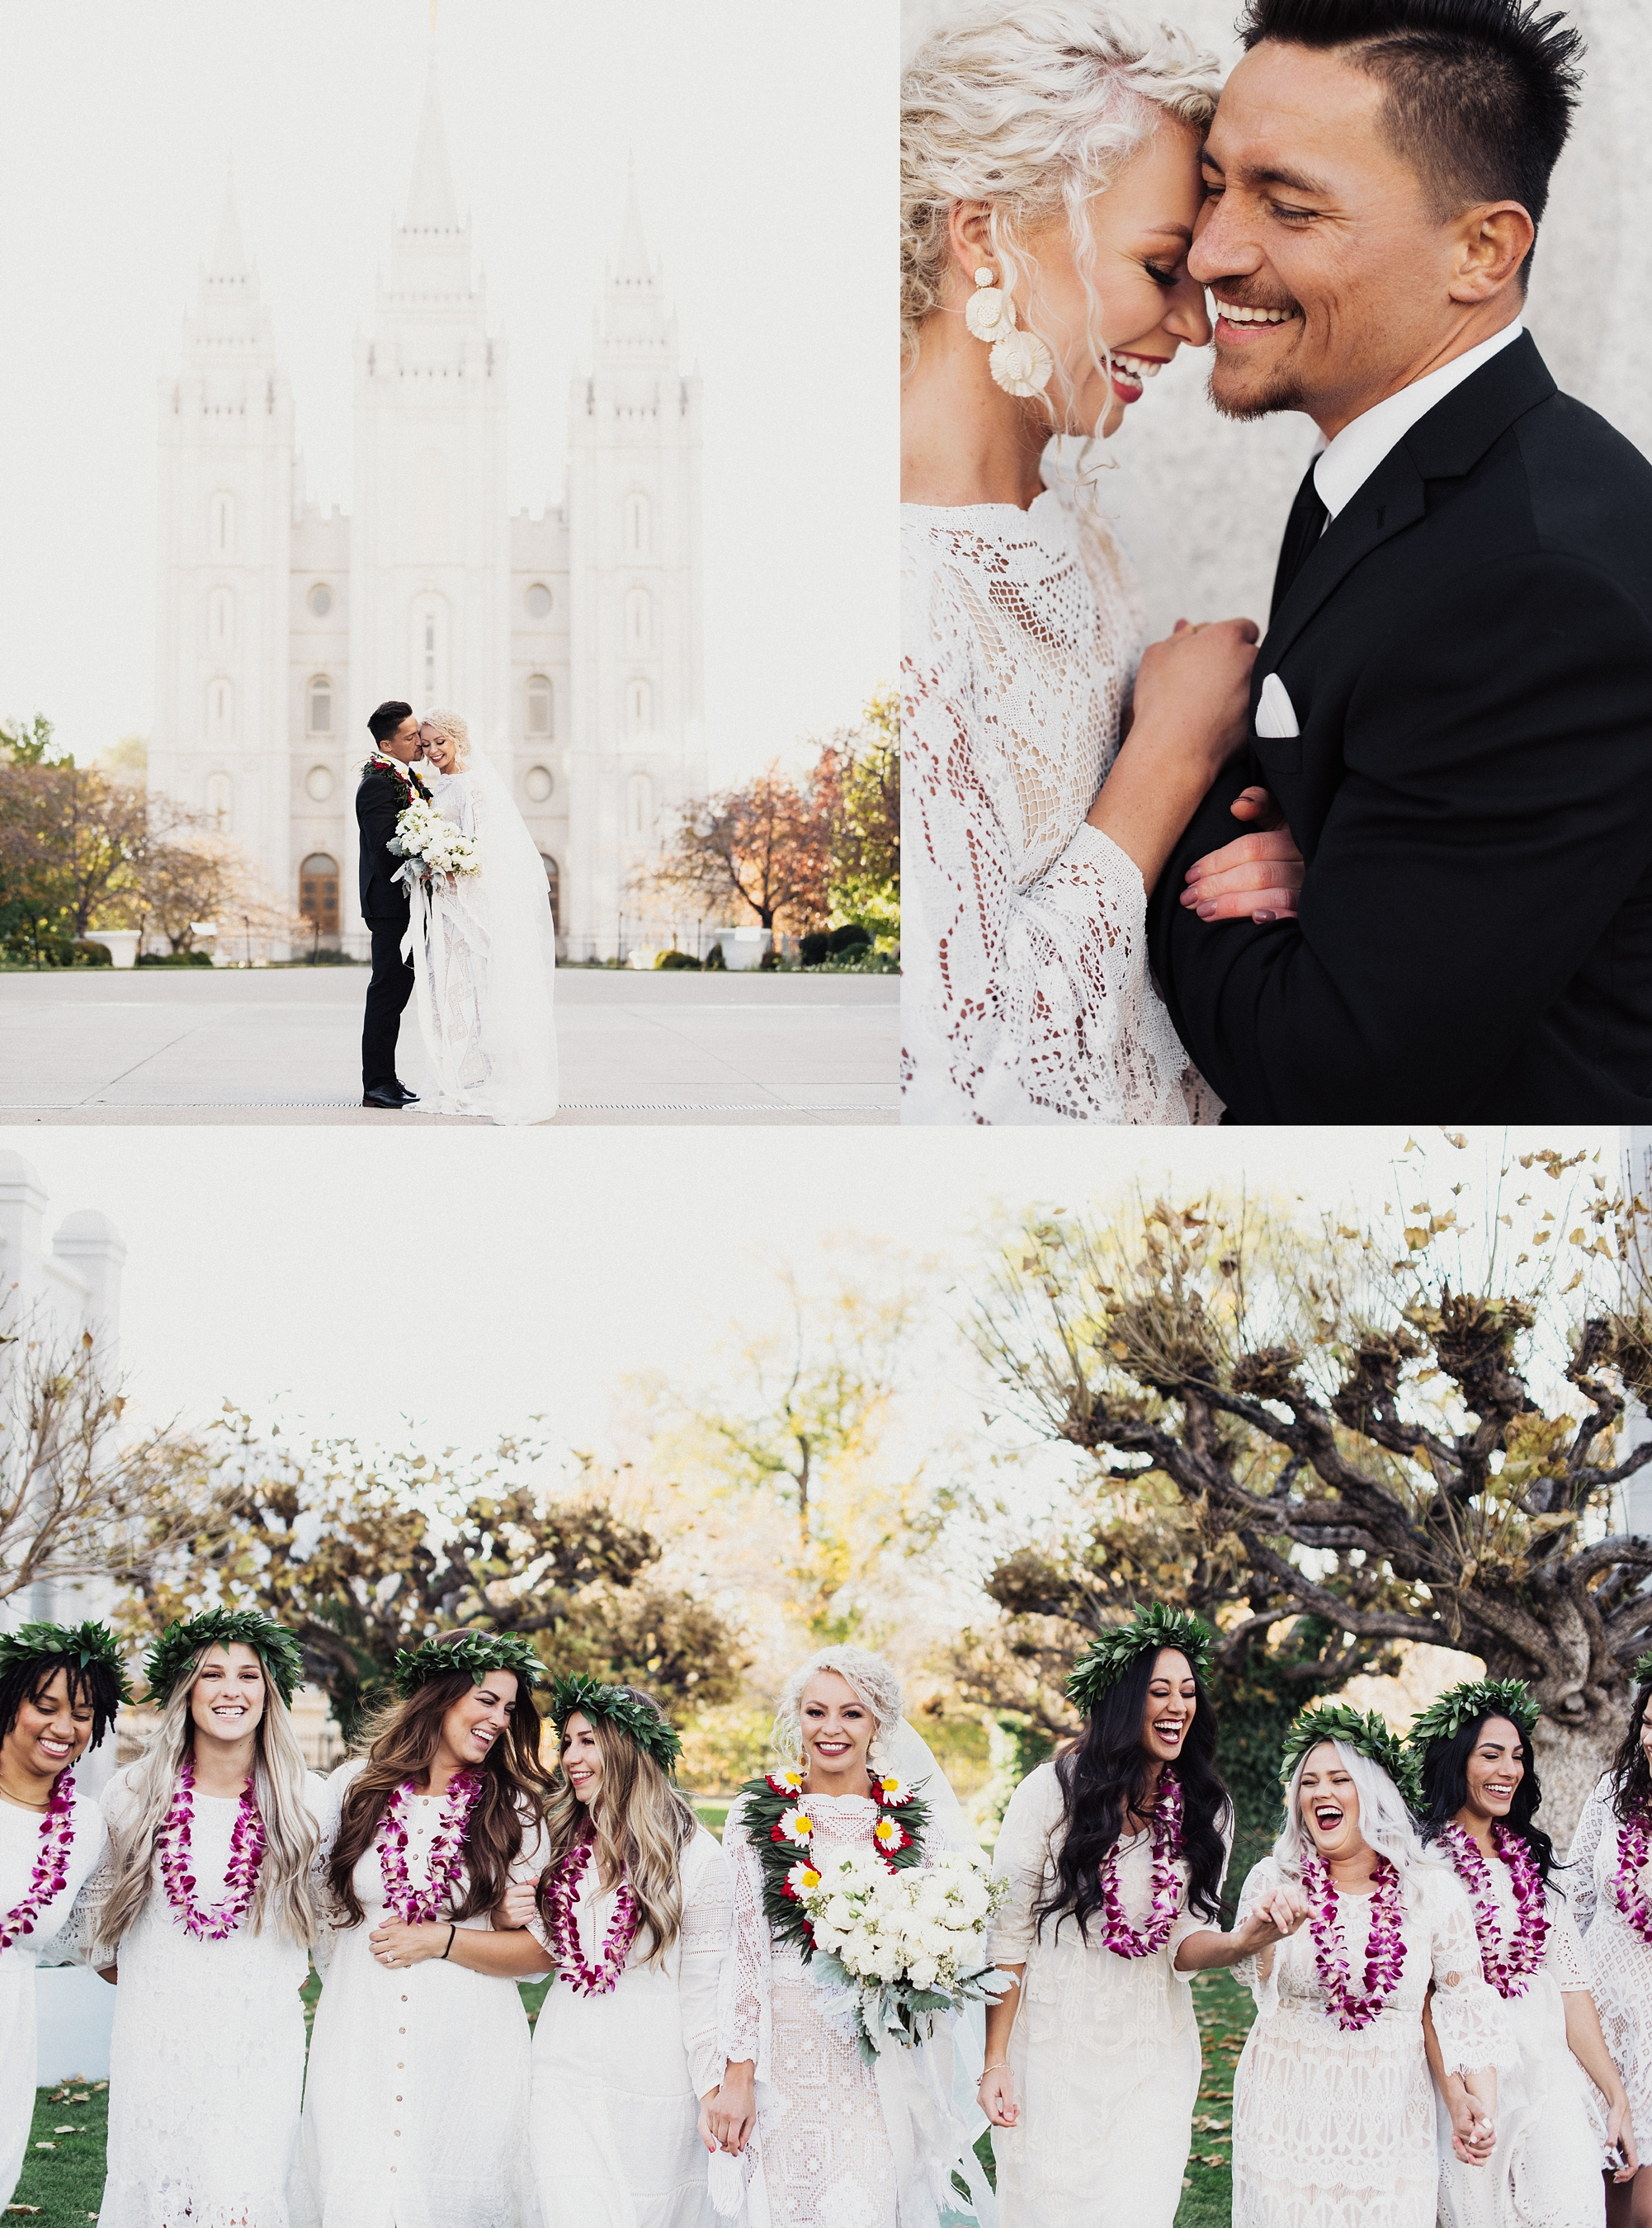 edenstraderphoto-weddingphotographer_1464.jpg